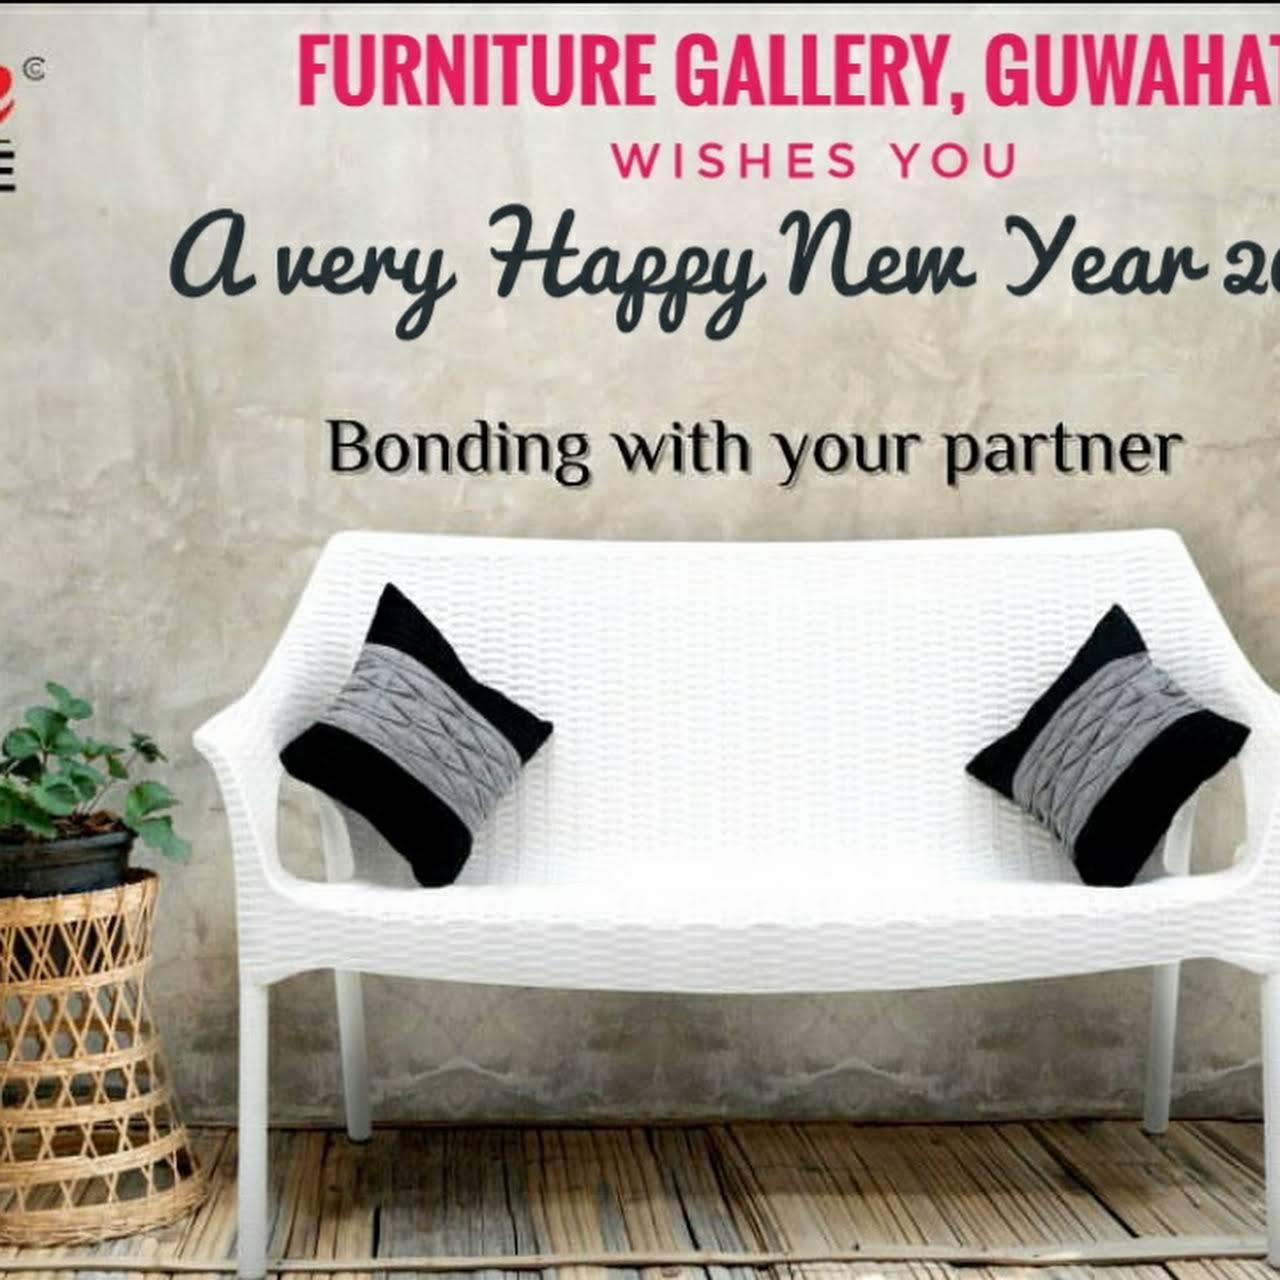 Furniture Gallery Furniture Wholesaler In Guwahati